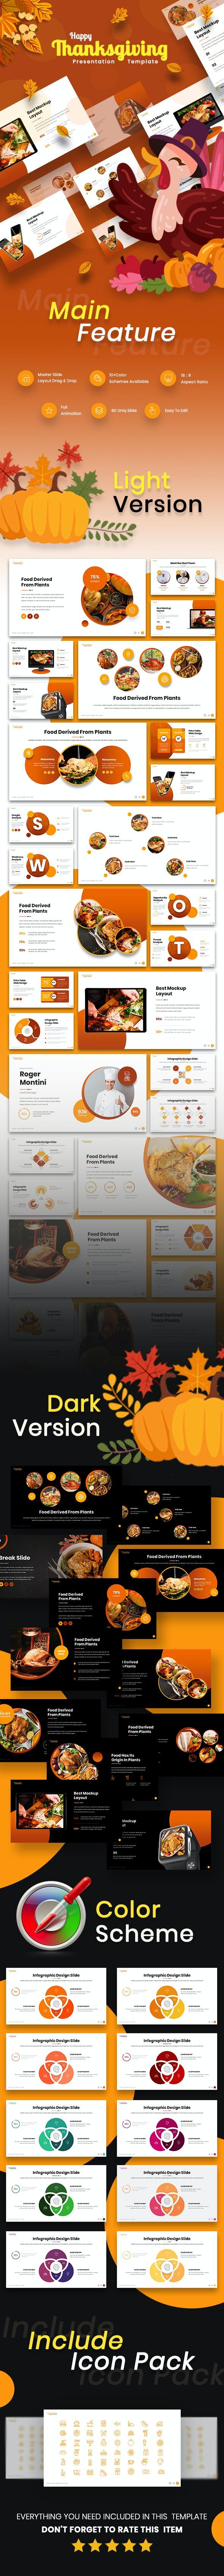 Happy Thanksgiving Keynote Template - Creative Keynote Templates